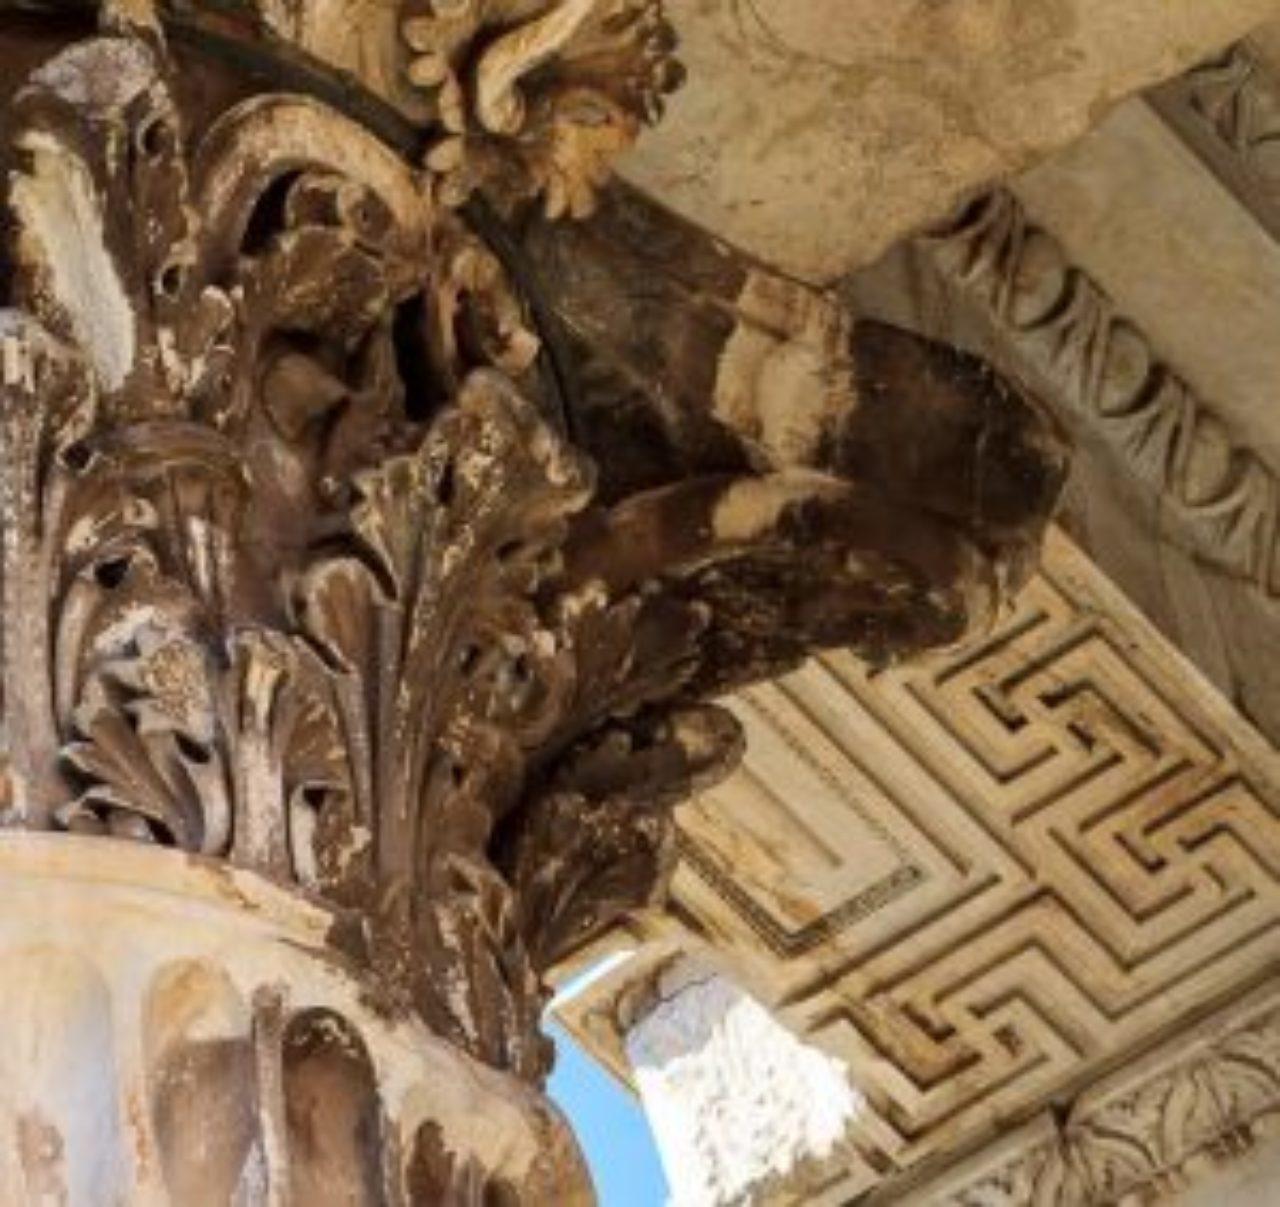 Figure 5: Soffit detail, Temple of Mars Ultor, Rome (www.JeffBondono.com).